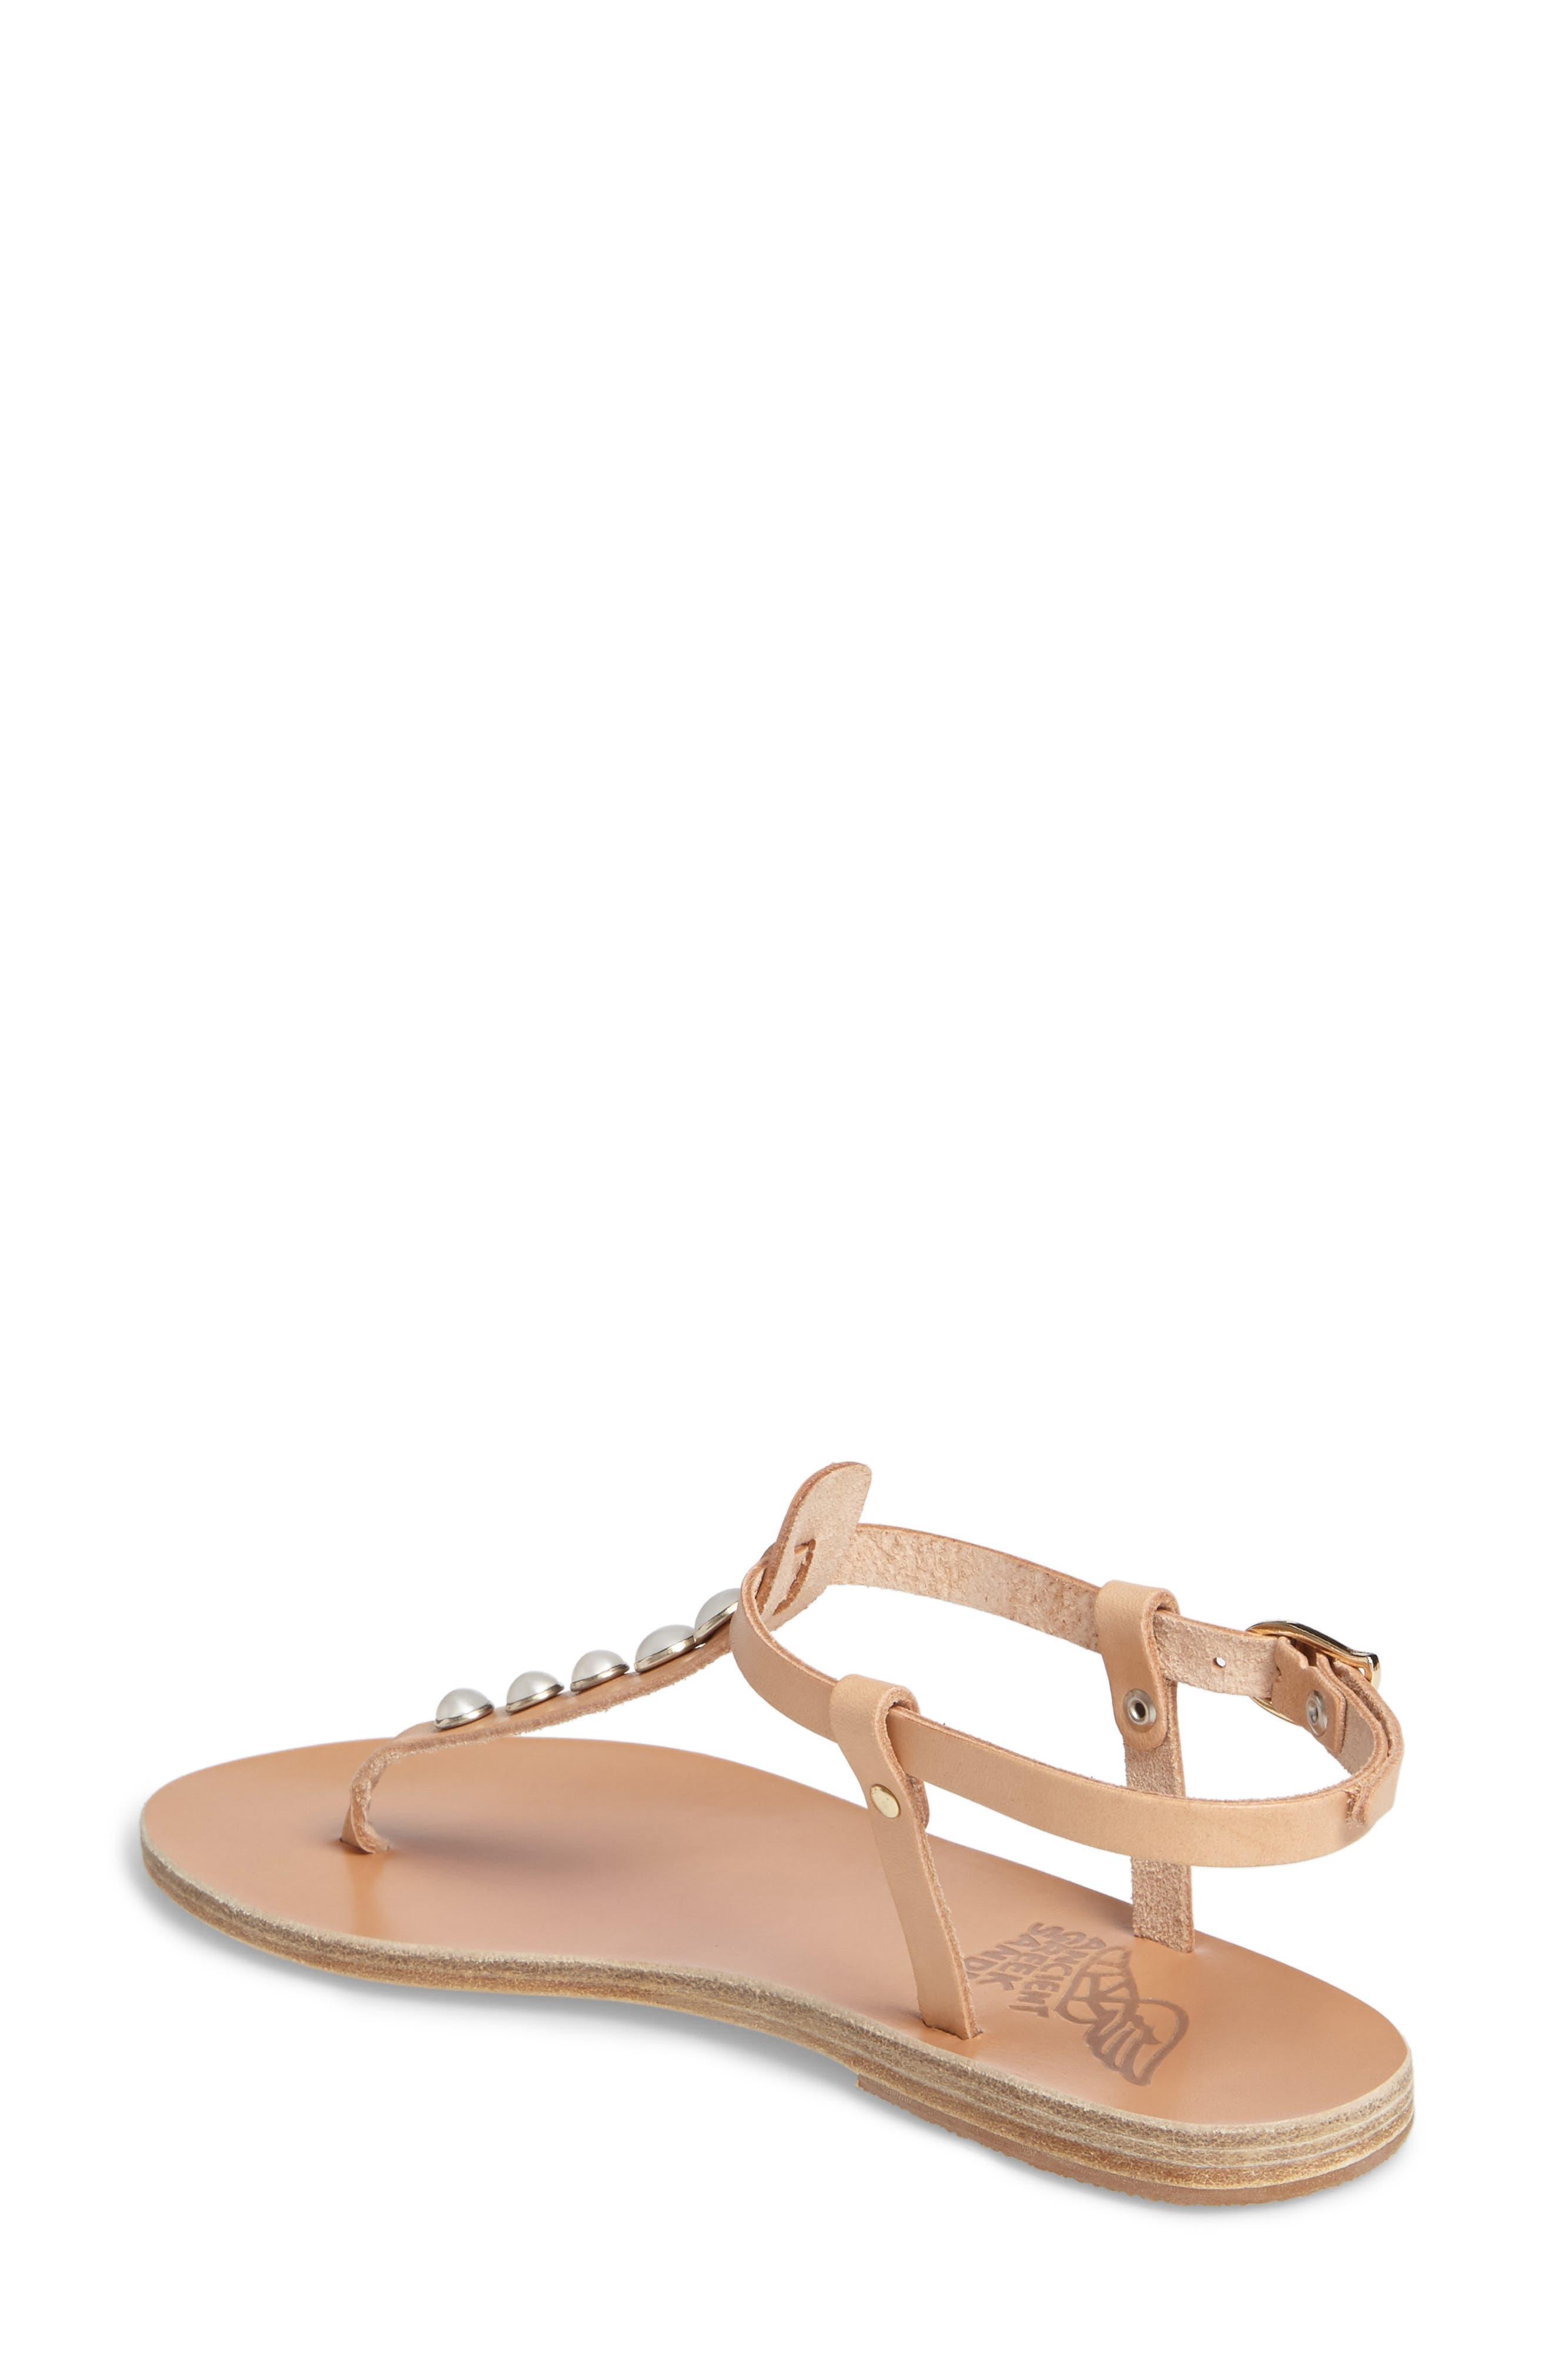 Lito Imitation Pearl Embellished T-Strap Sandal,                             Alternate thumbnail 2, color,                             Natural Vachetta